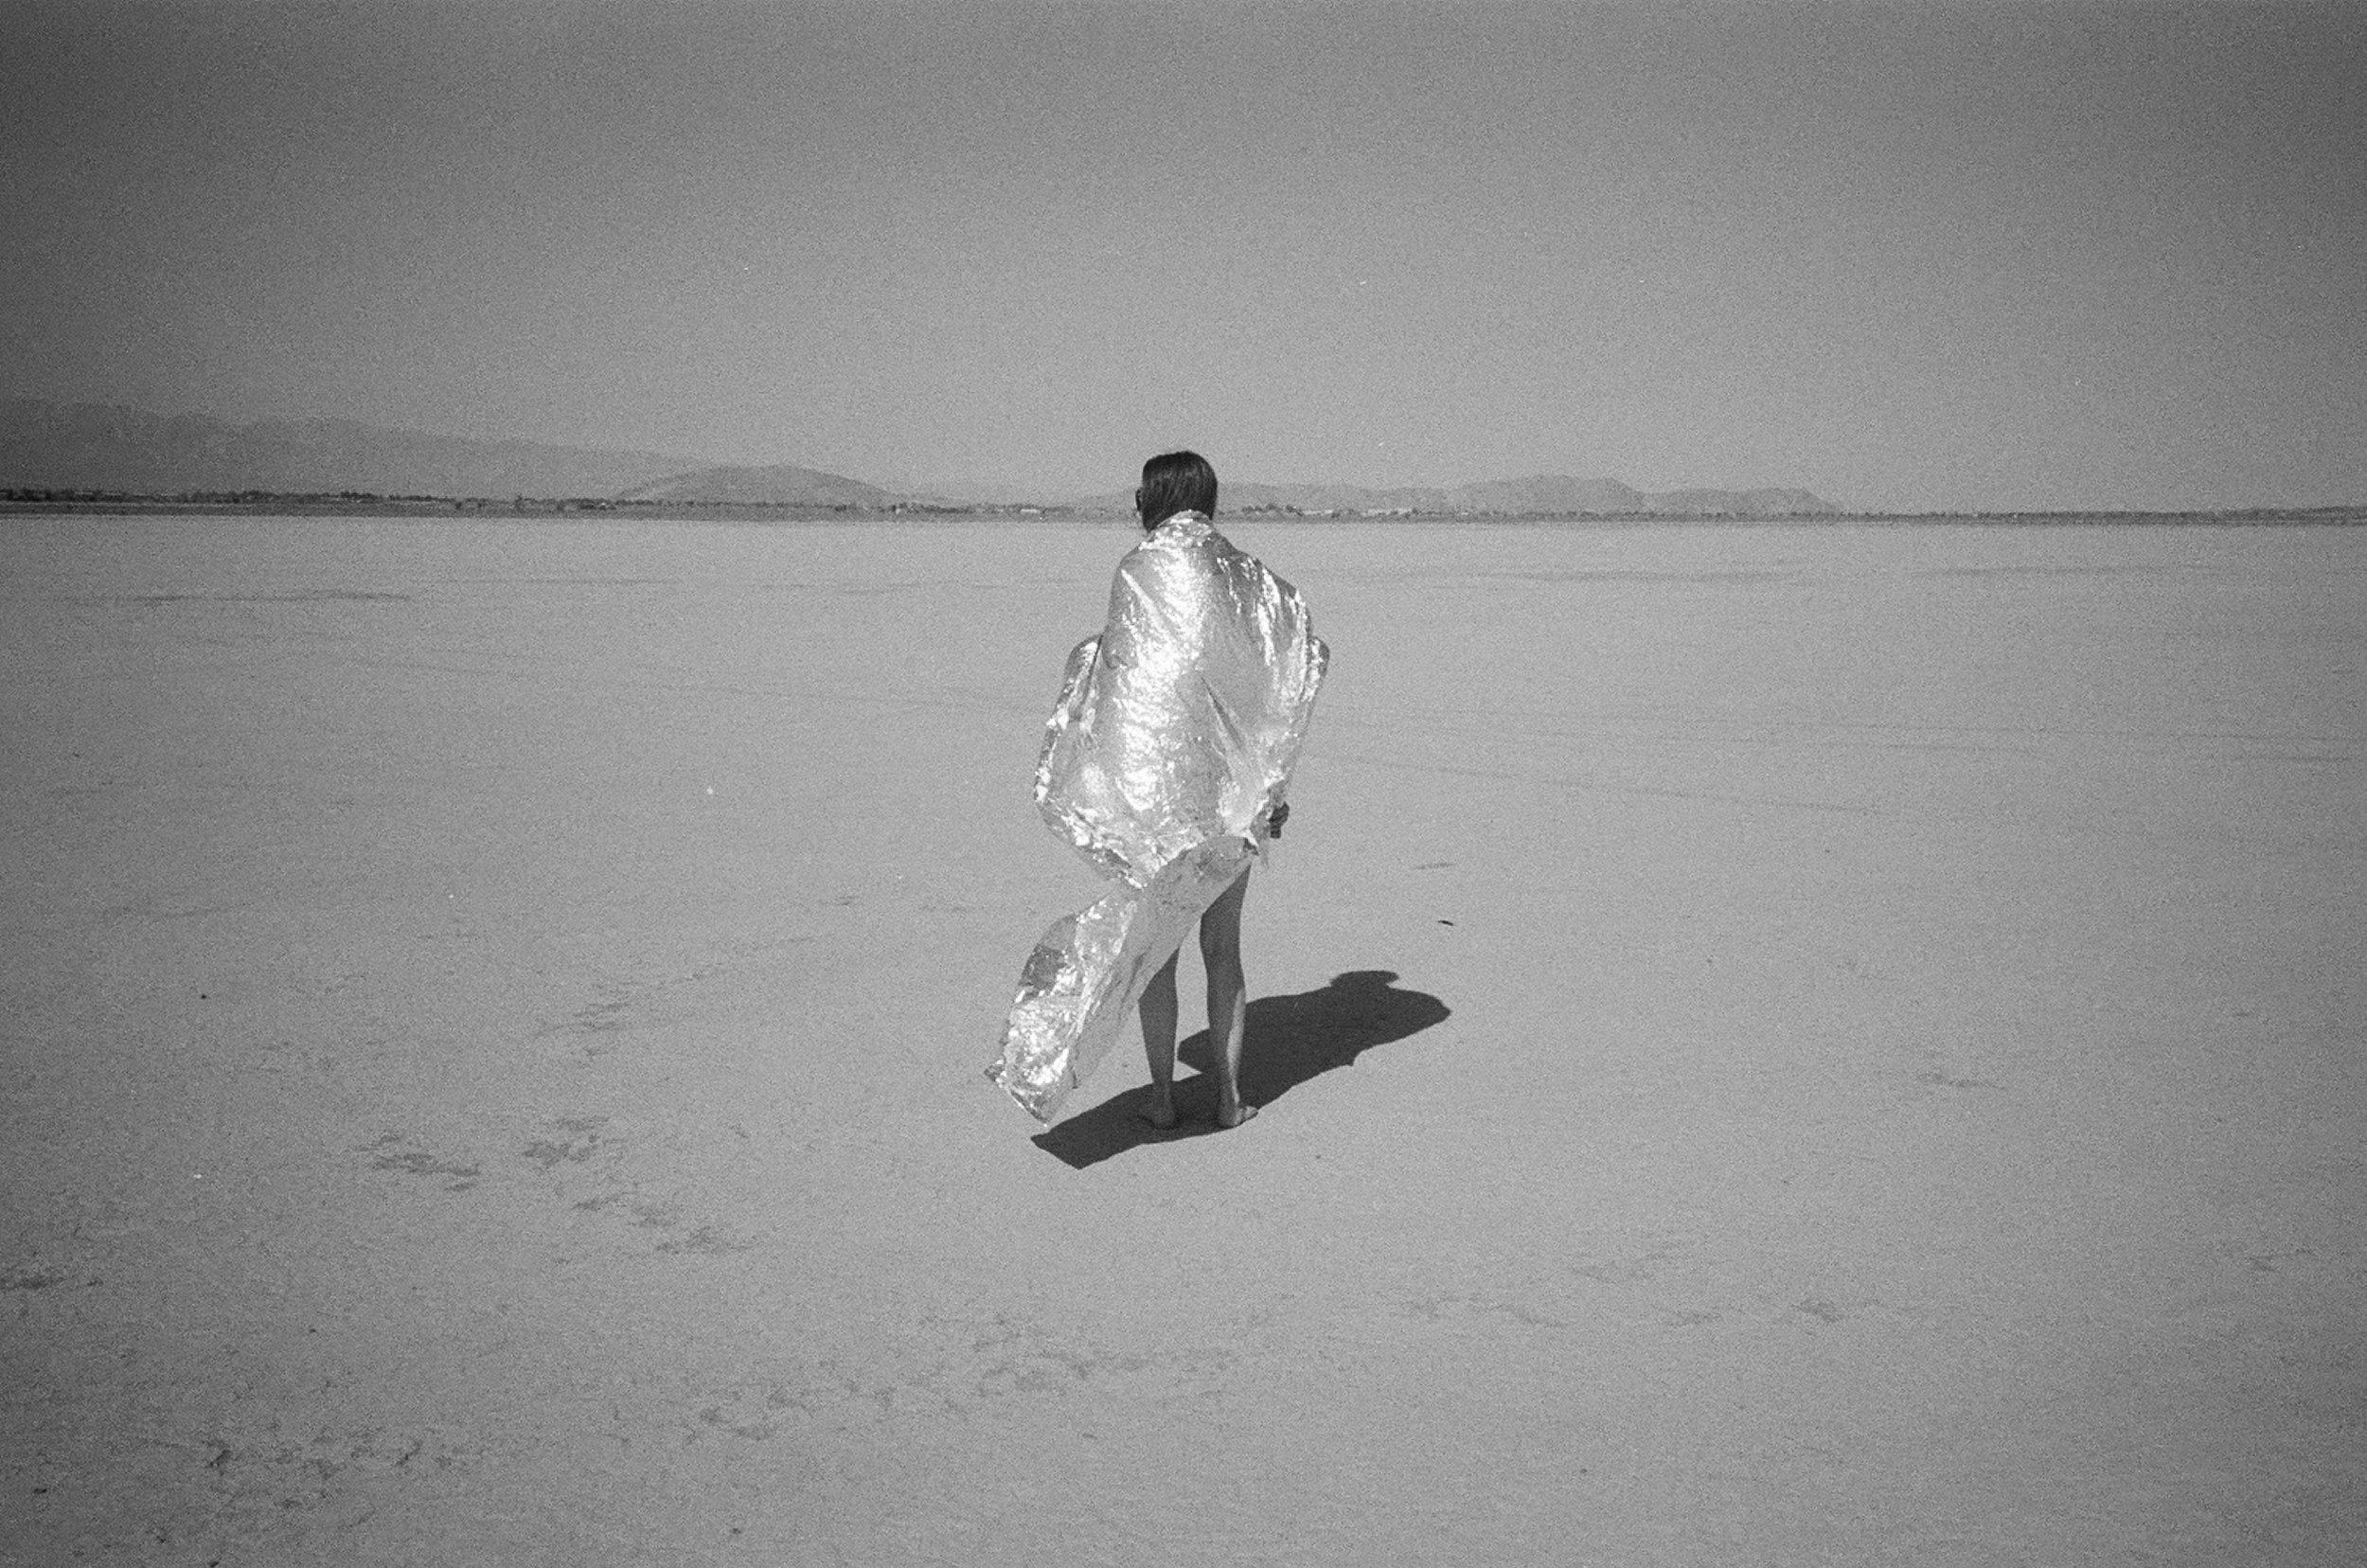 desertbw-13.jpg